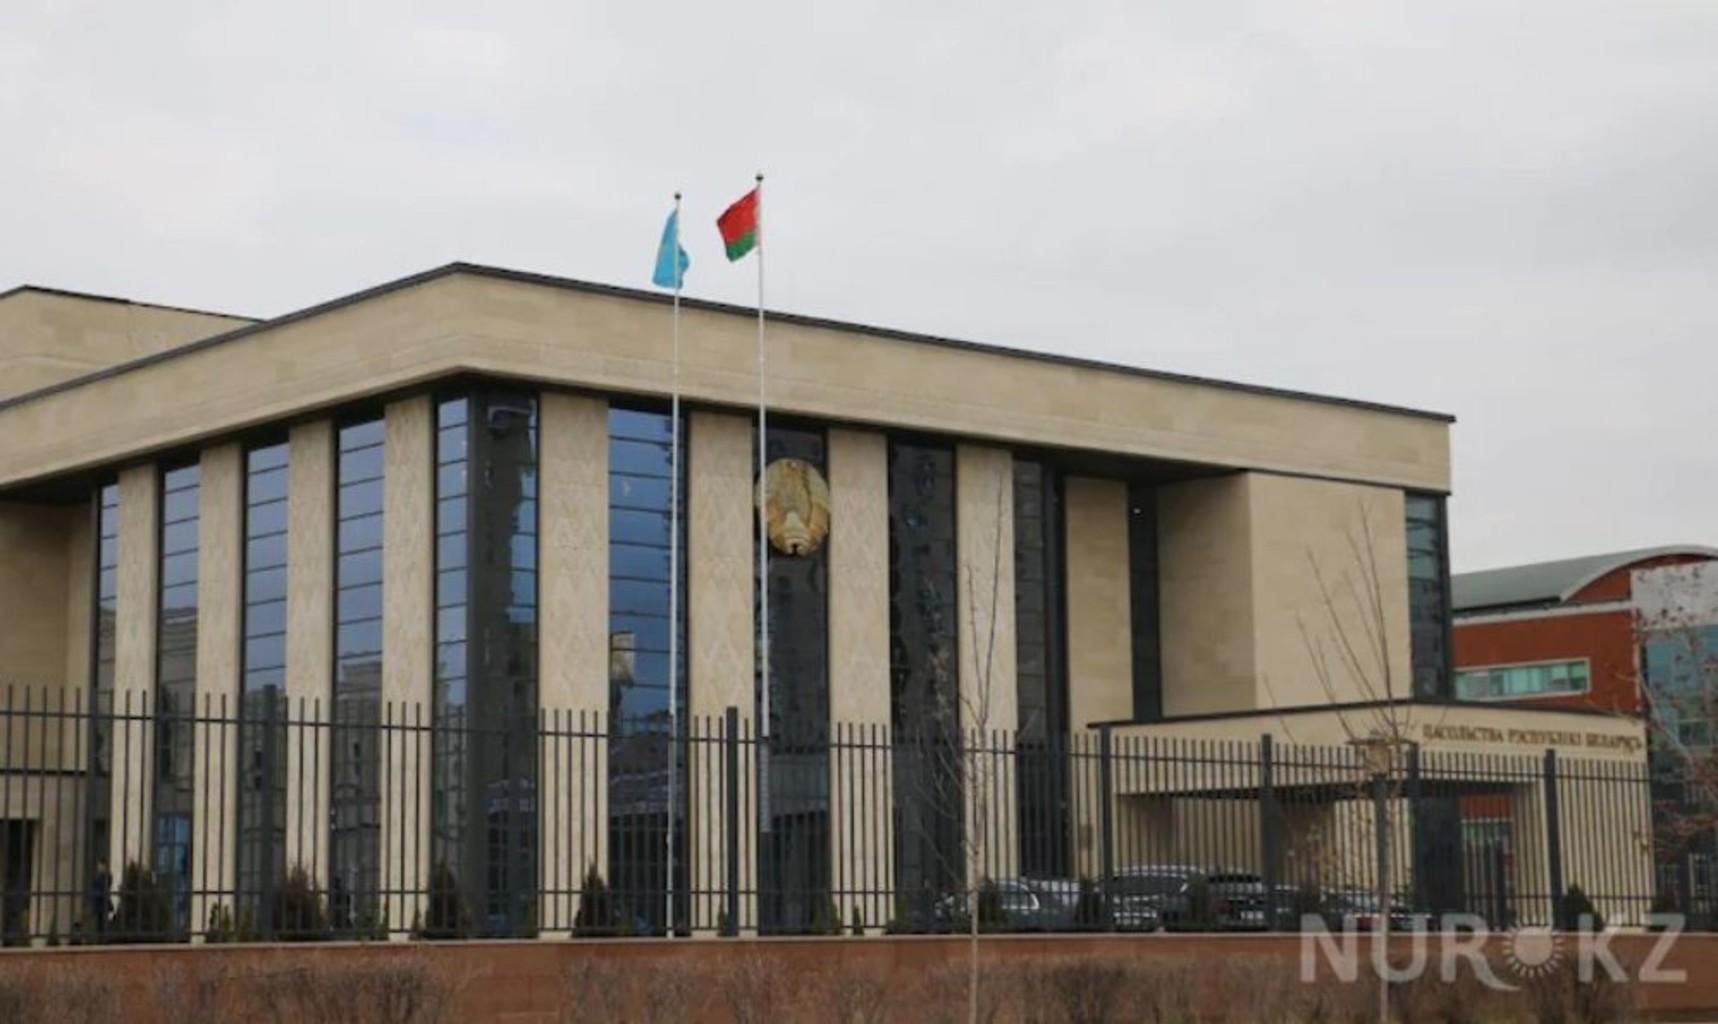 Posolstvo belarusi v kazakhstane24 1